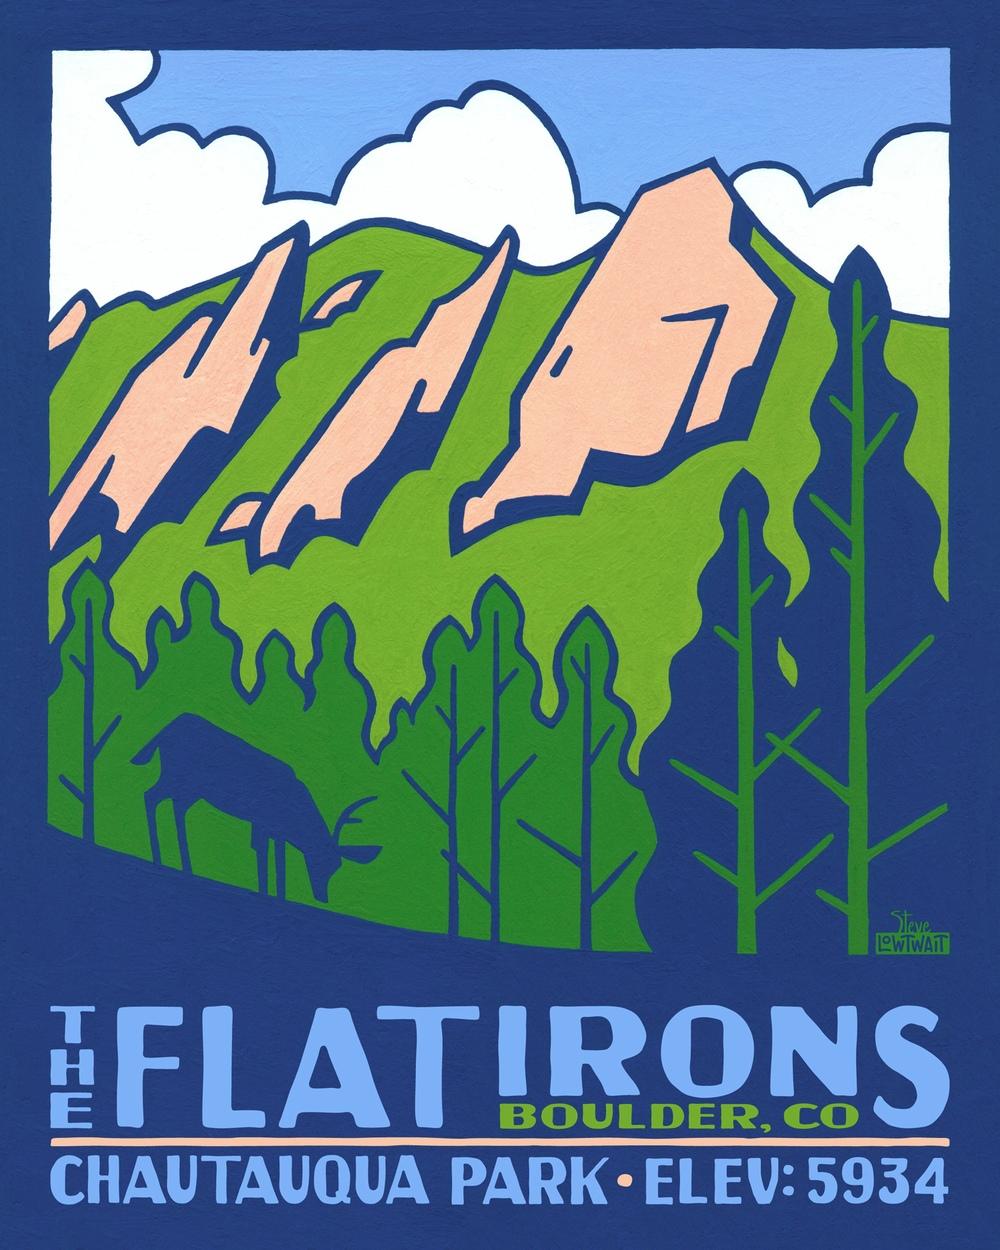 The Flatirons - Boulder, Colorado• Buy